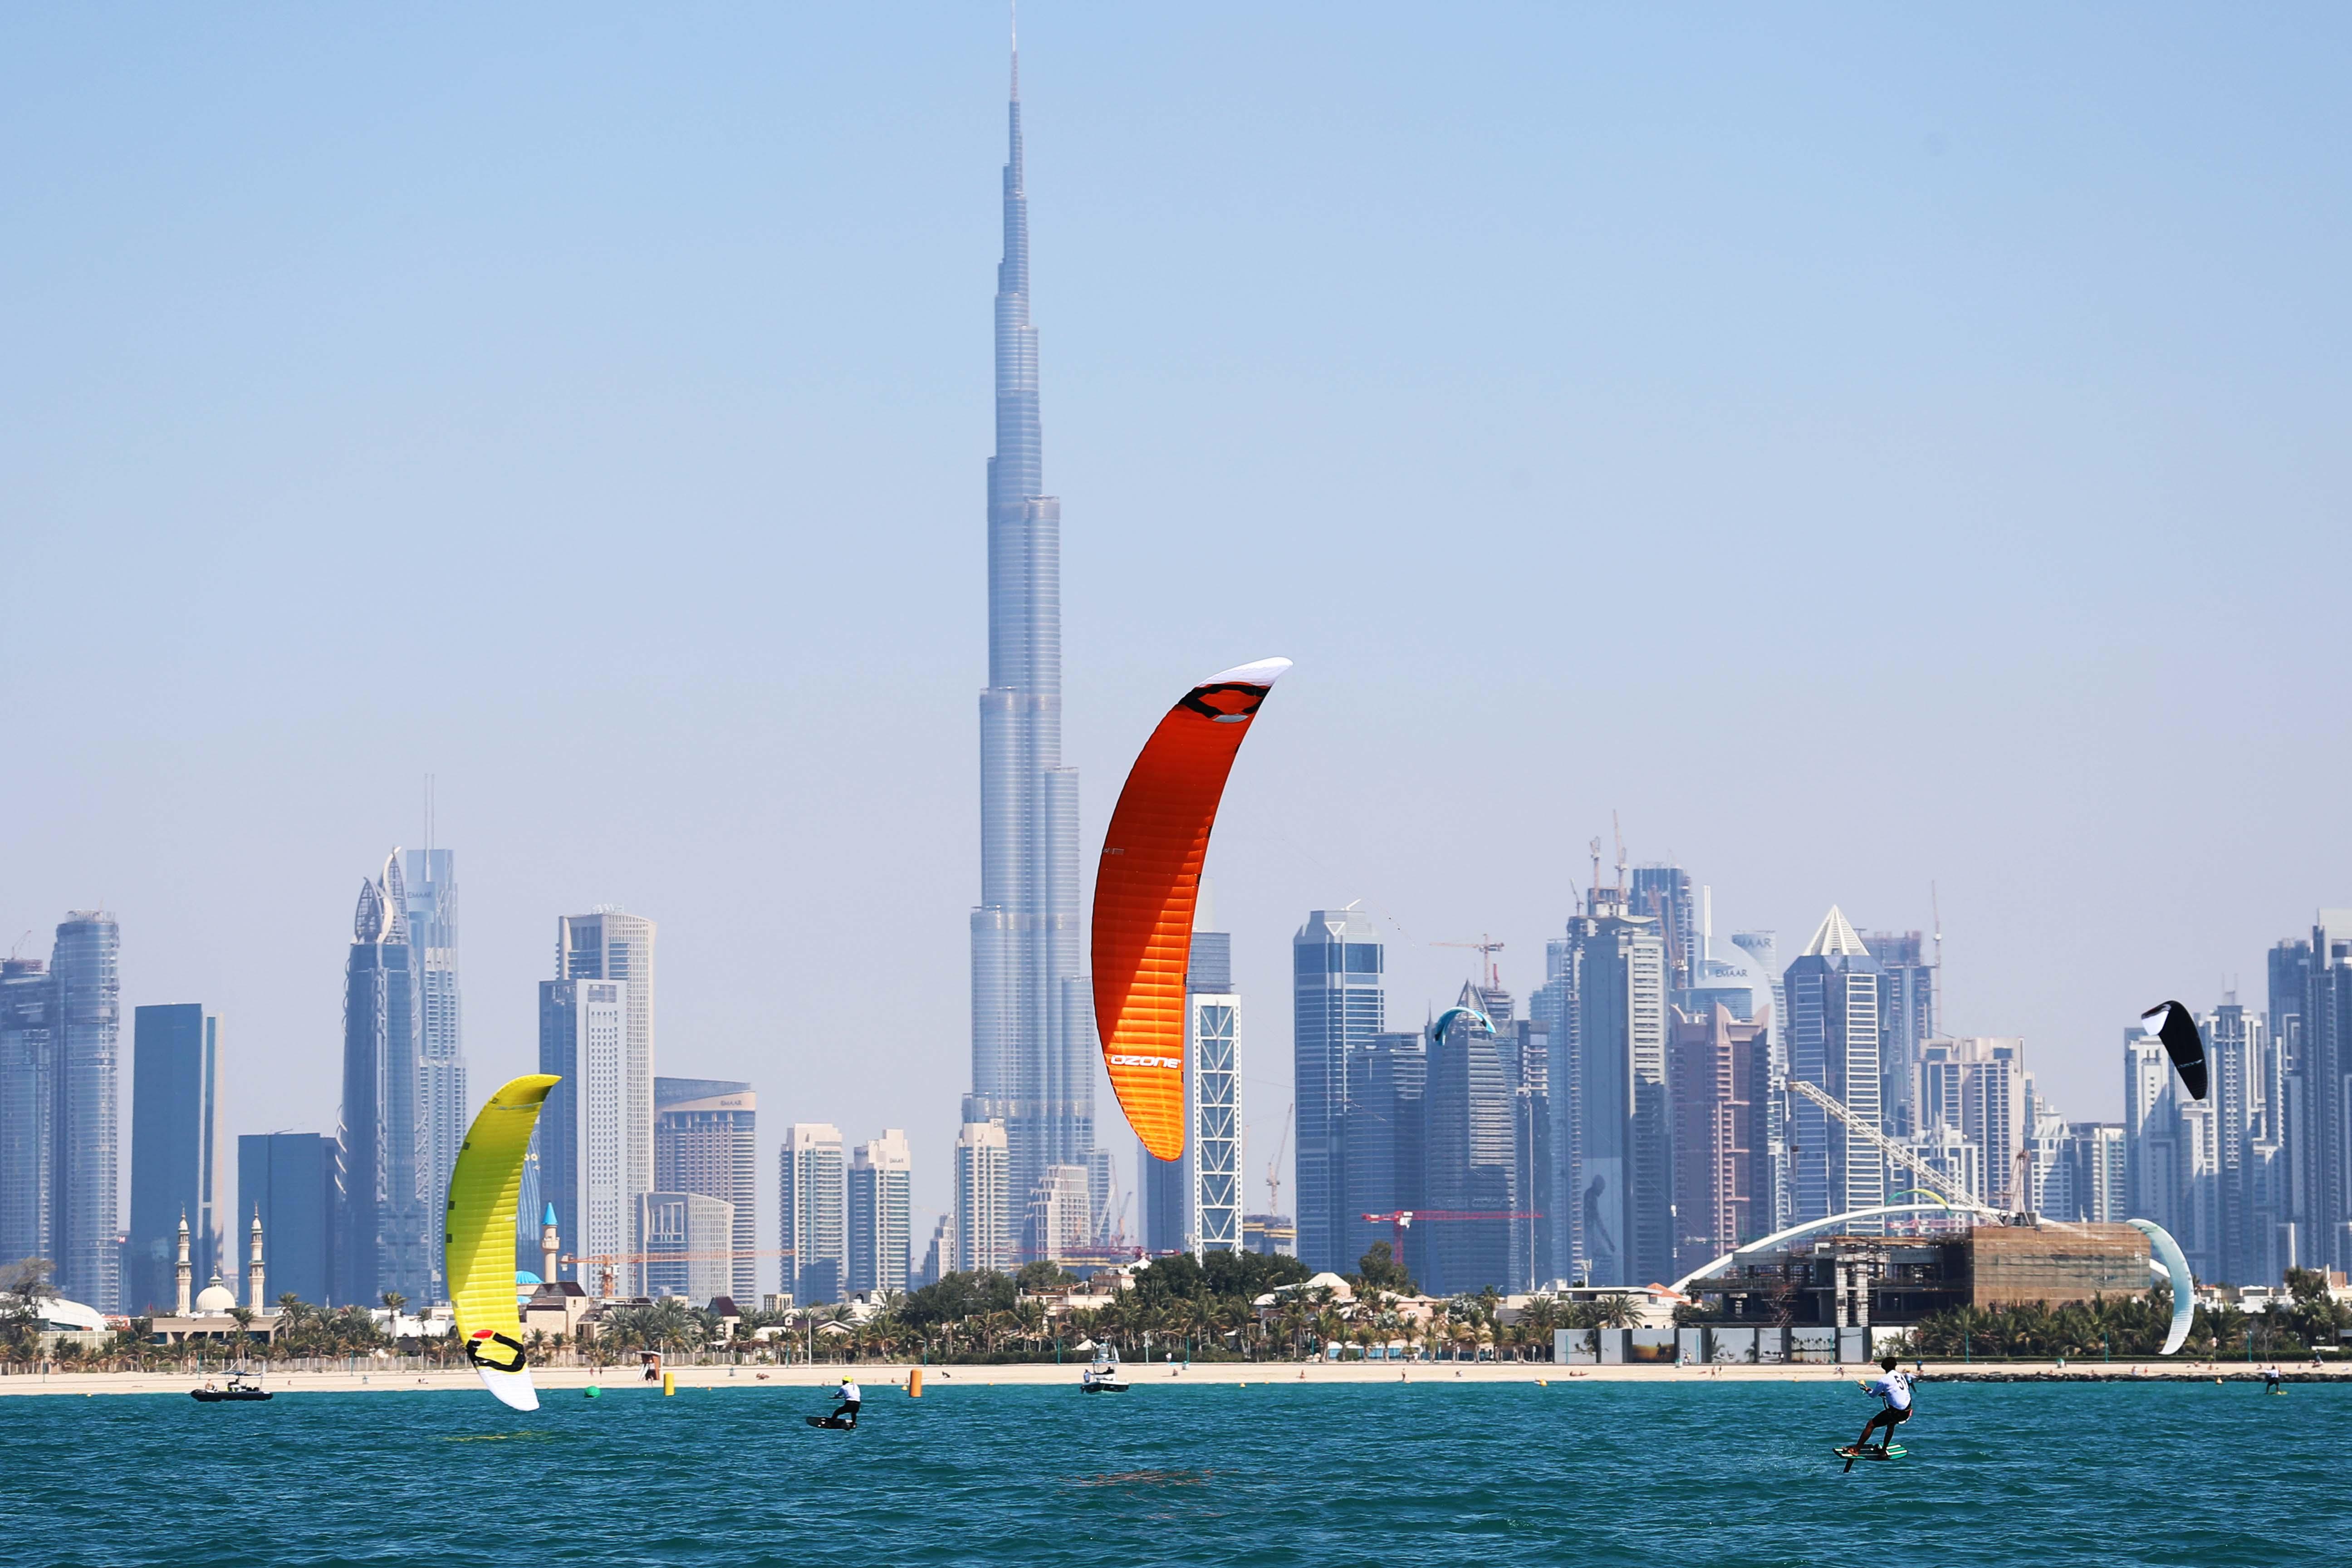 Dubai Kitesurf Open launches the DIMC activities for 2020